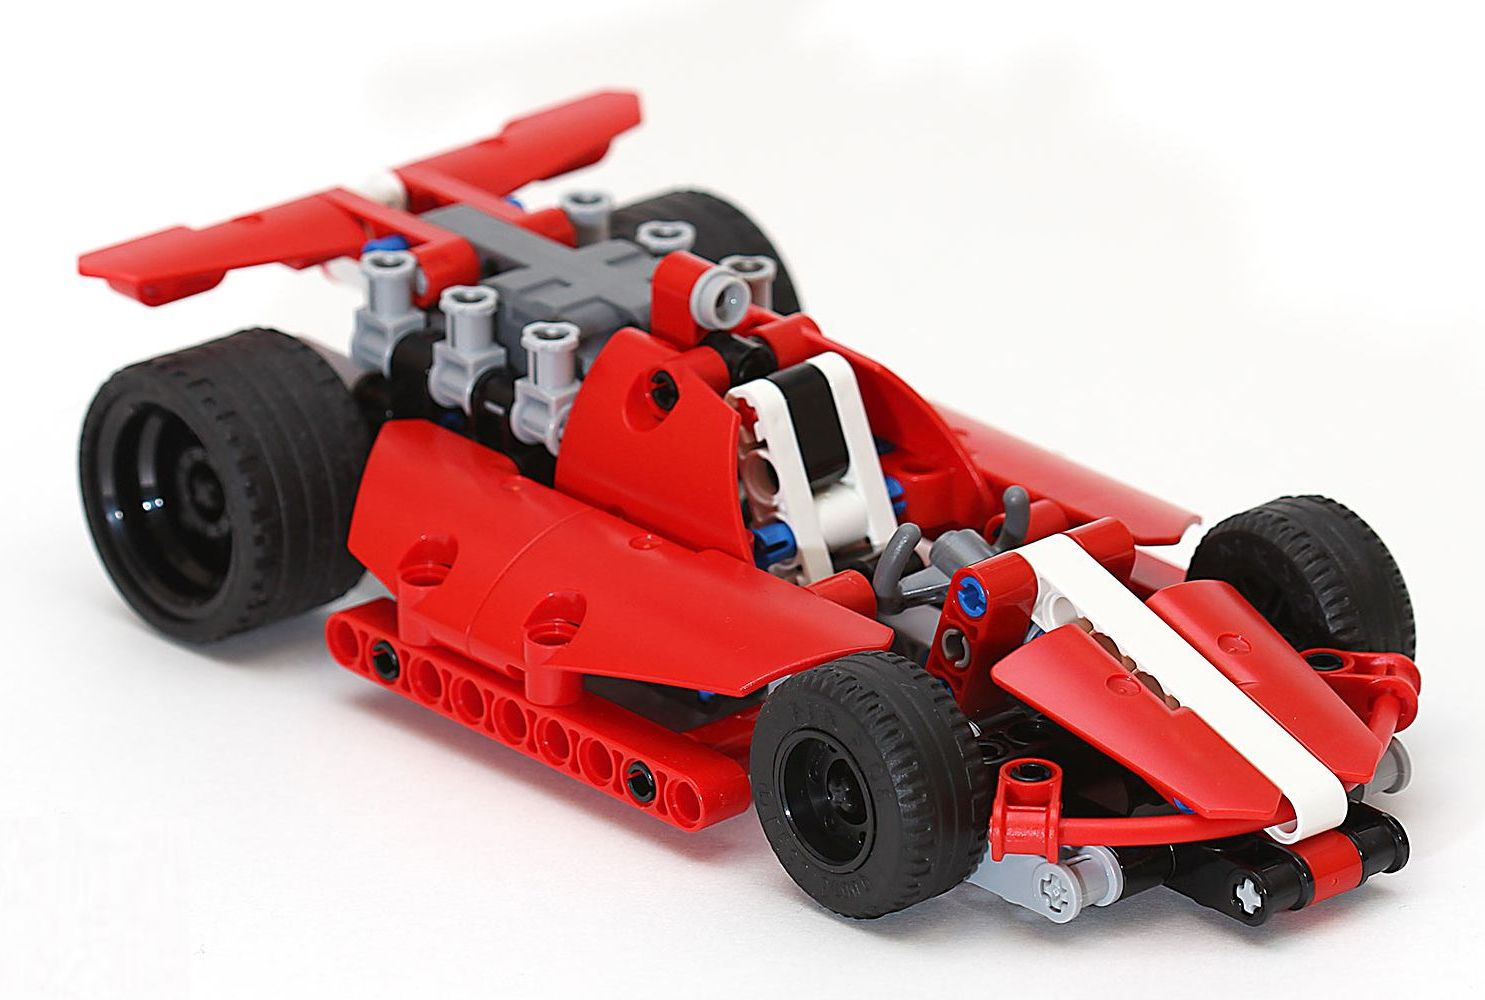 Lego Technic  Race Car Instructions